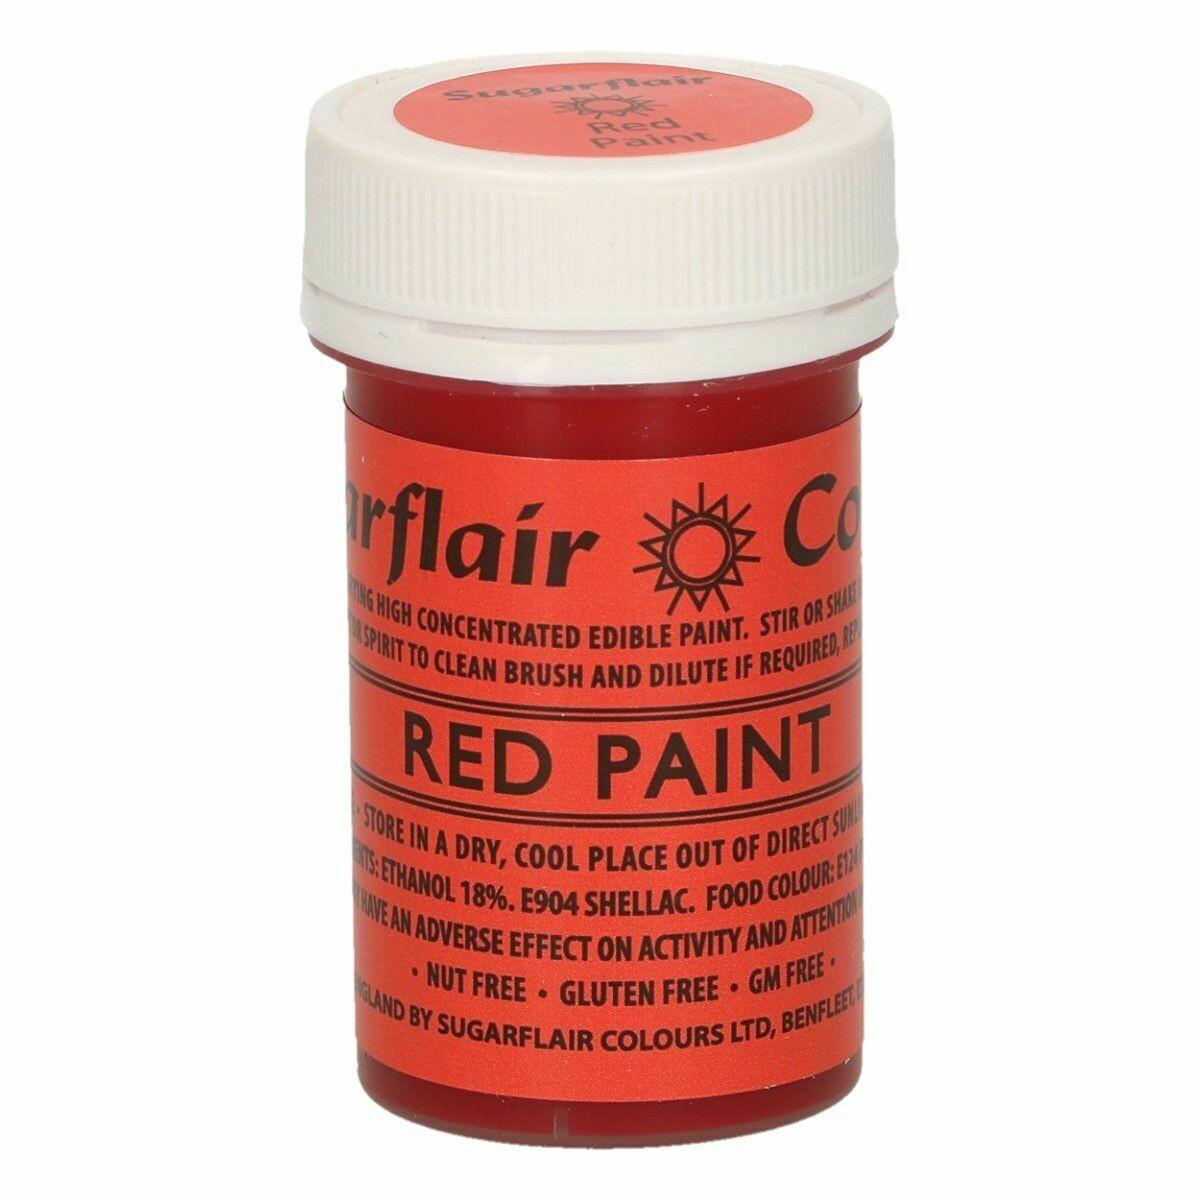 Sugarflair Matt Food Paints -RED -Ματ Βρώσιμο Χρώμα Ζωγραφικής -Κόκκινο 20γρ